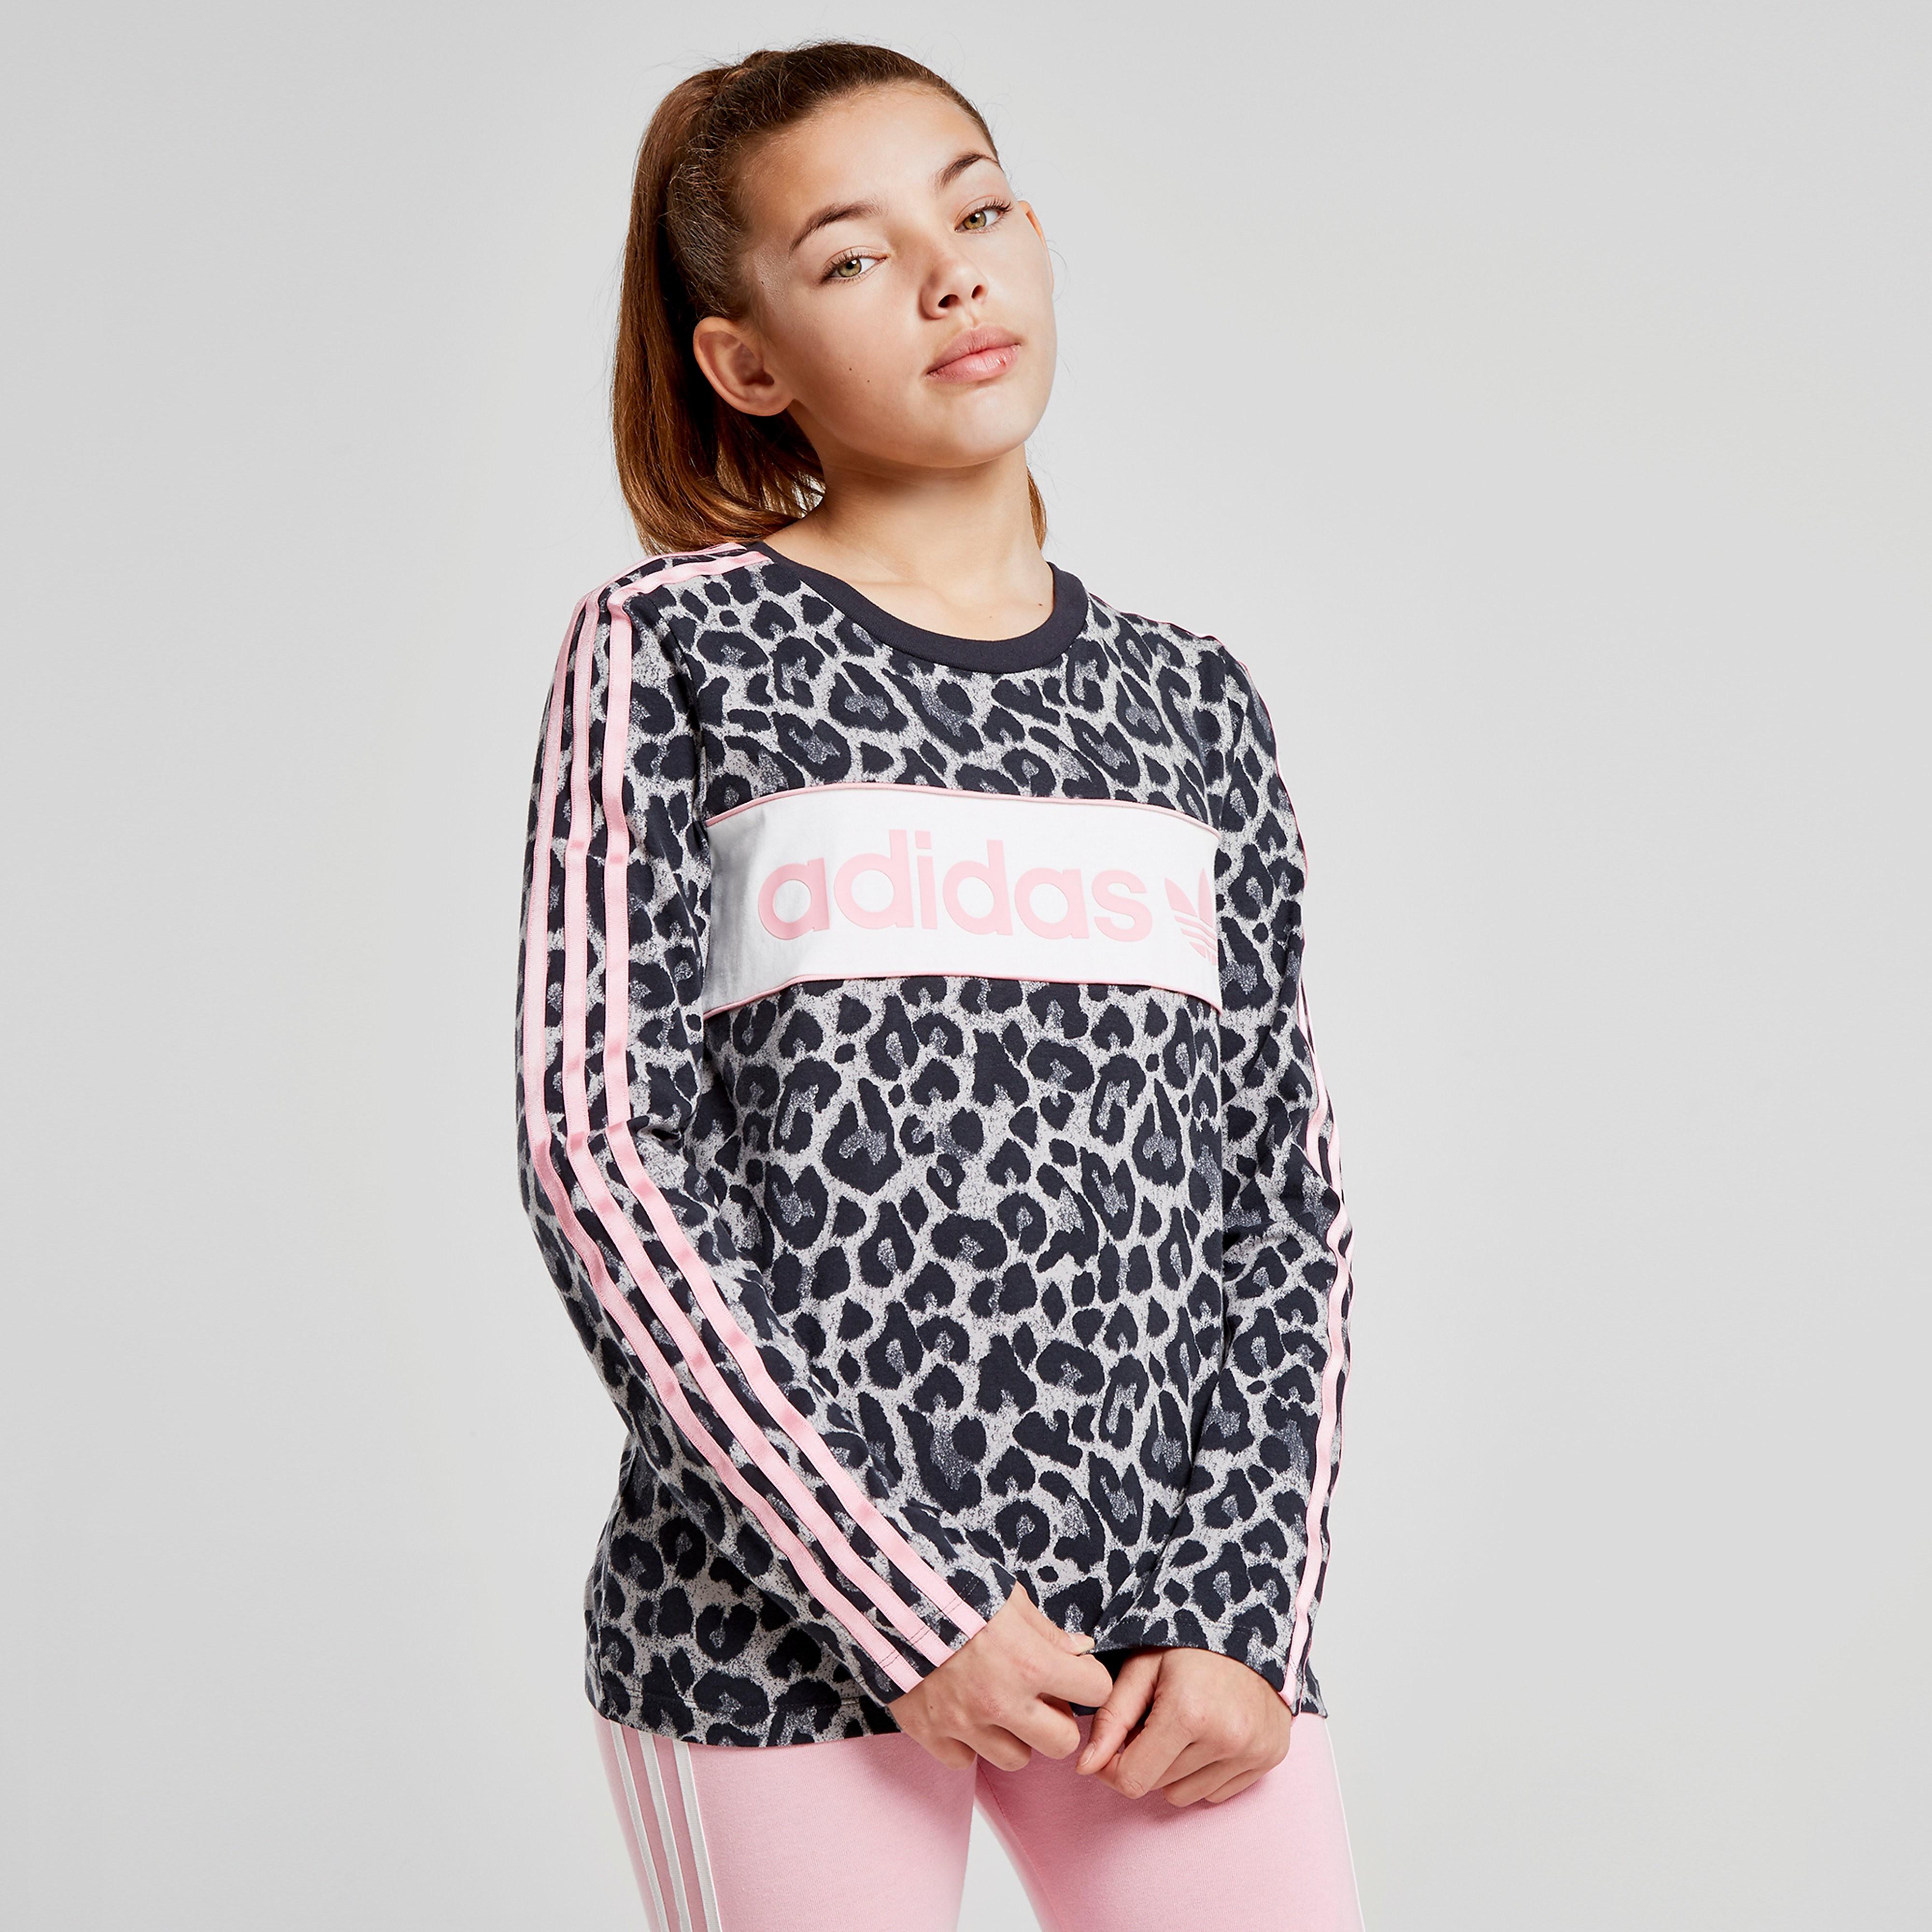 adidas Originals Girls' Long Sleeve Leopard T-Shirt Junior - alleen bij JD - Grijs - Kind